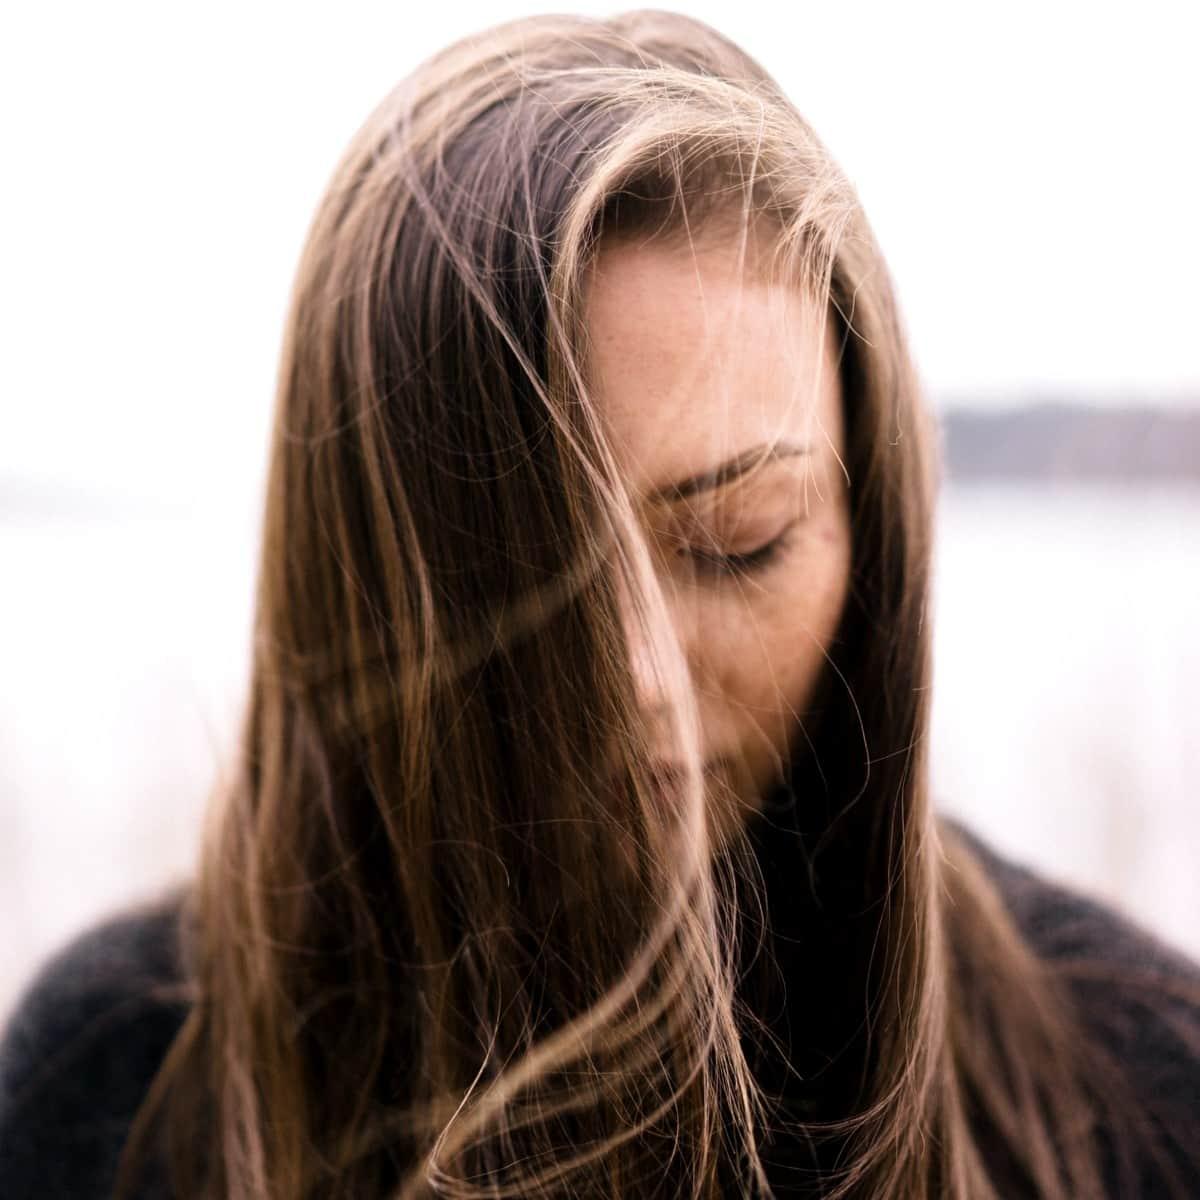 Prayer: When You Feel Broken